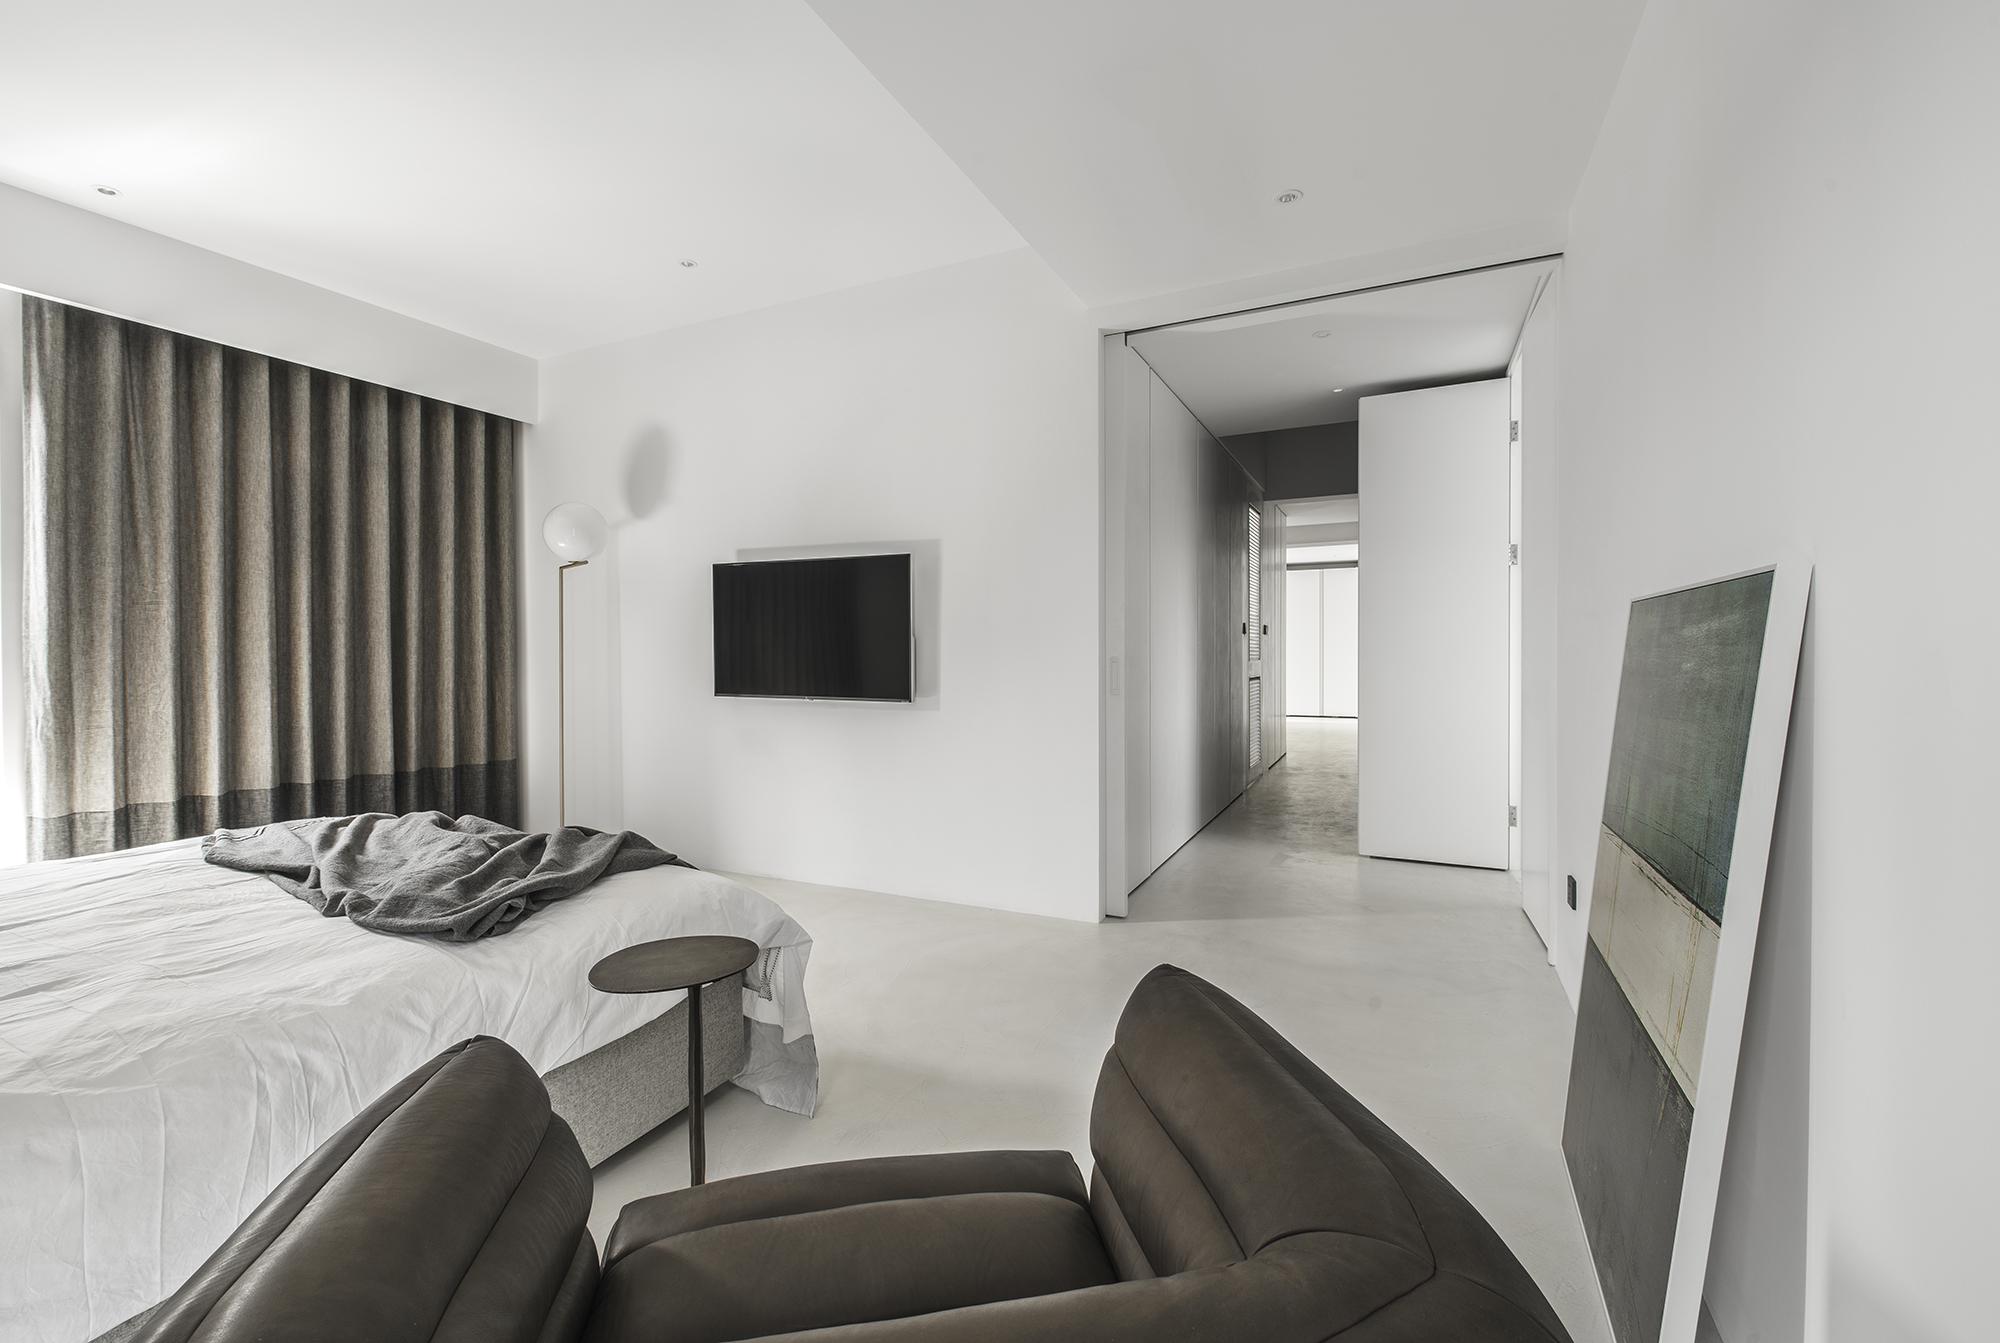 45, 3F Main Bedroom